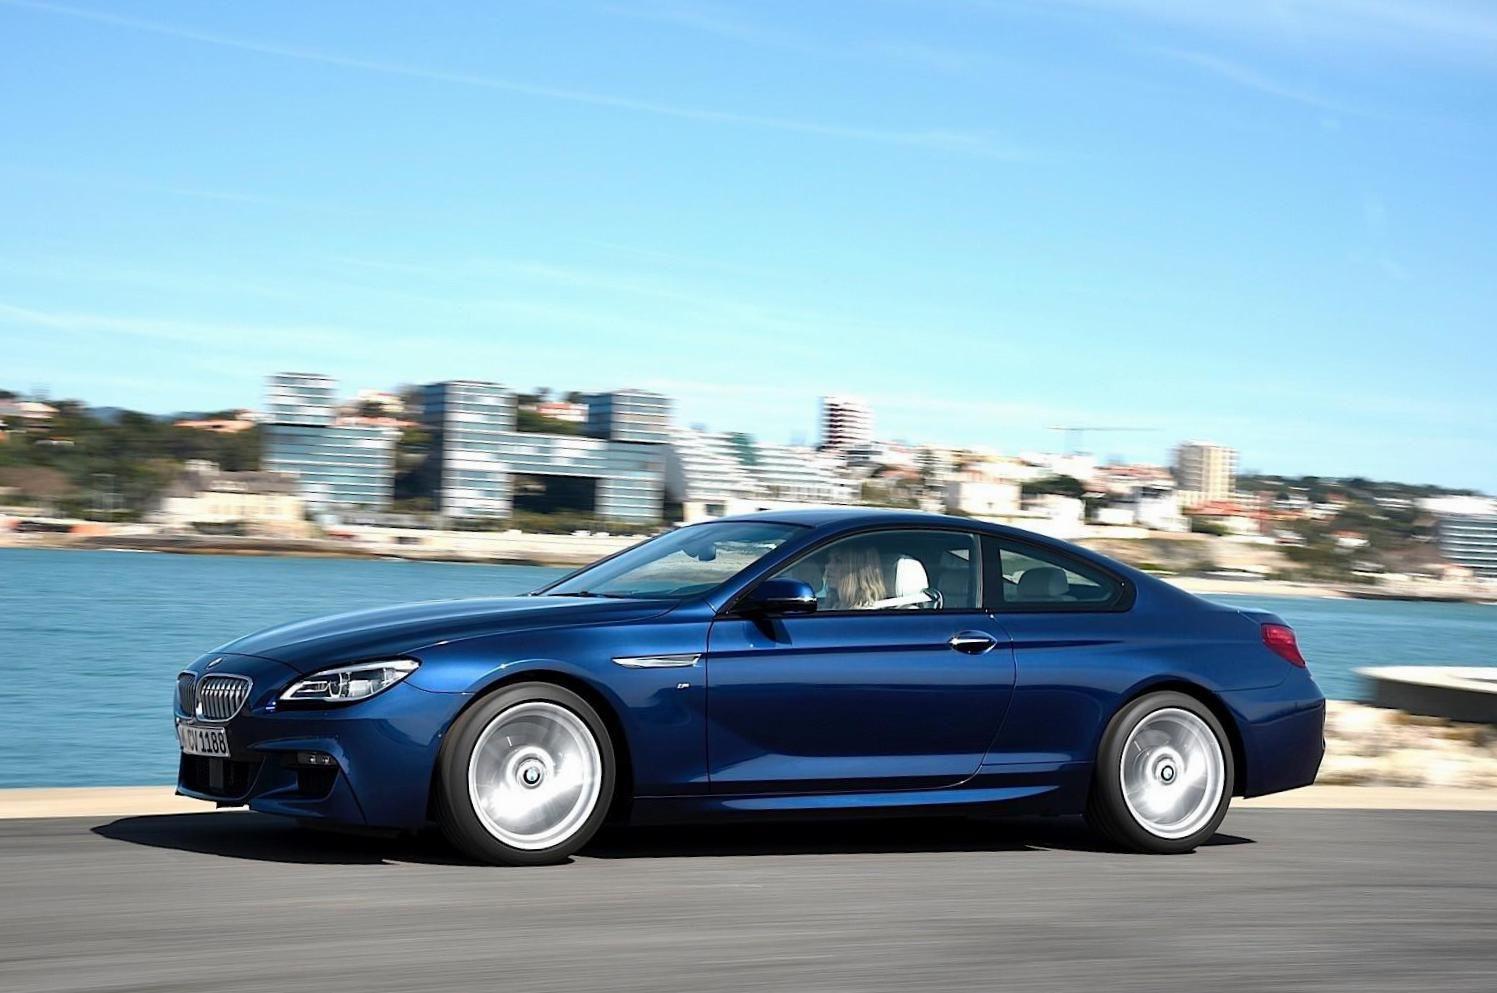 6 Series Coupe (F13) BMW review - http://autotras.com